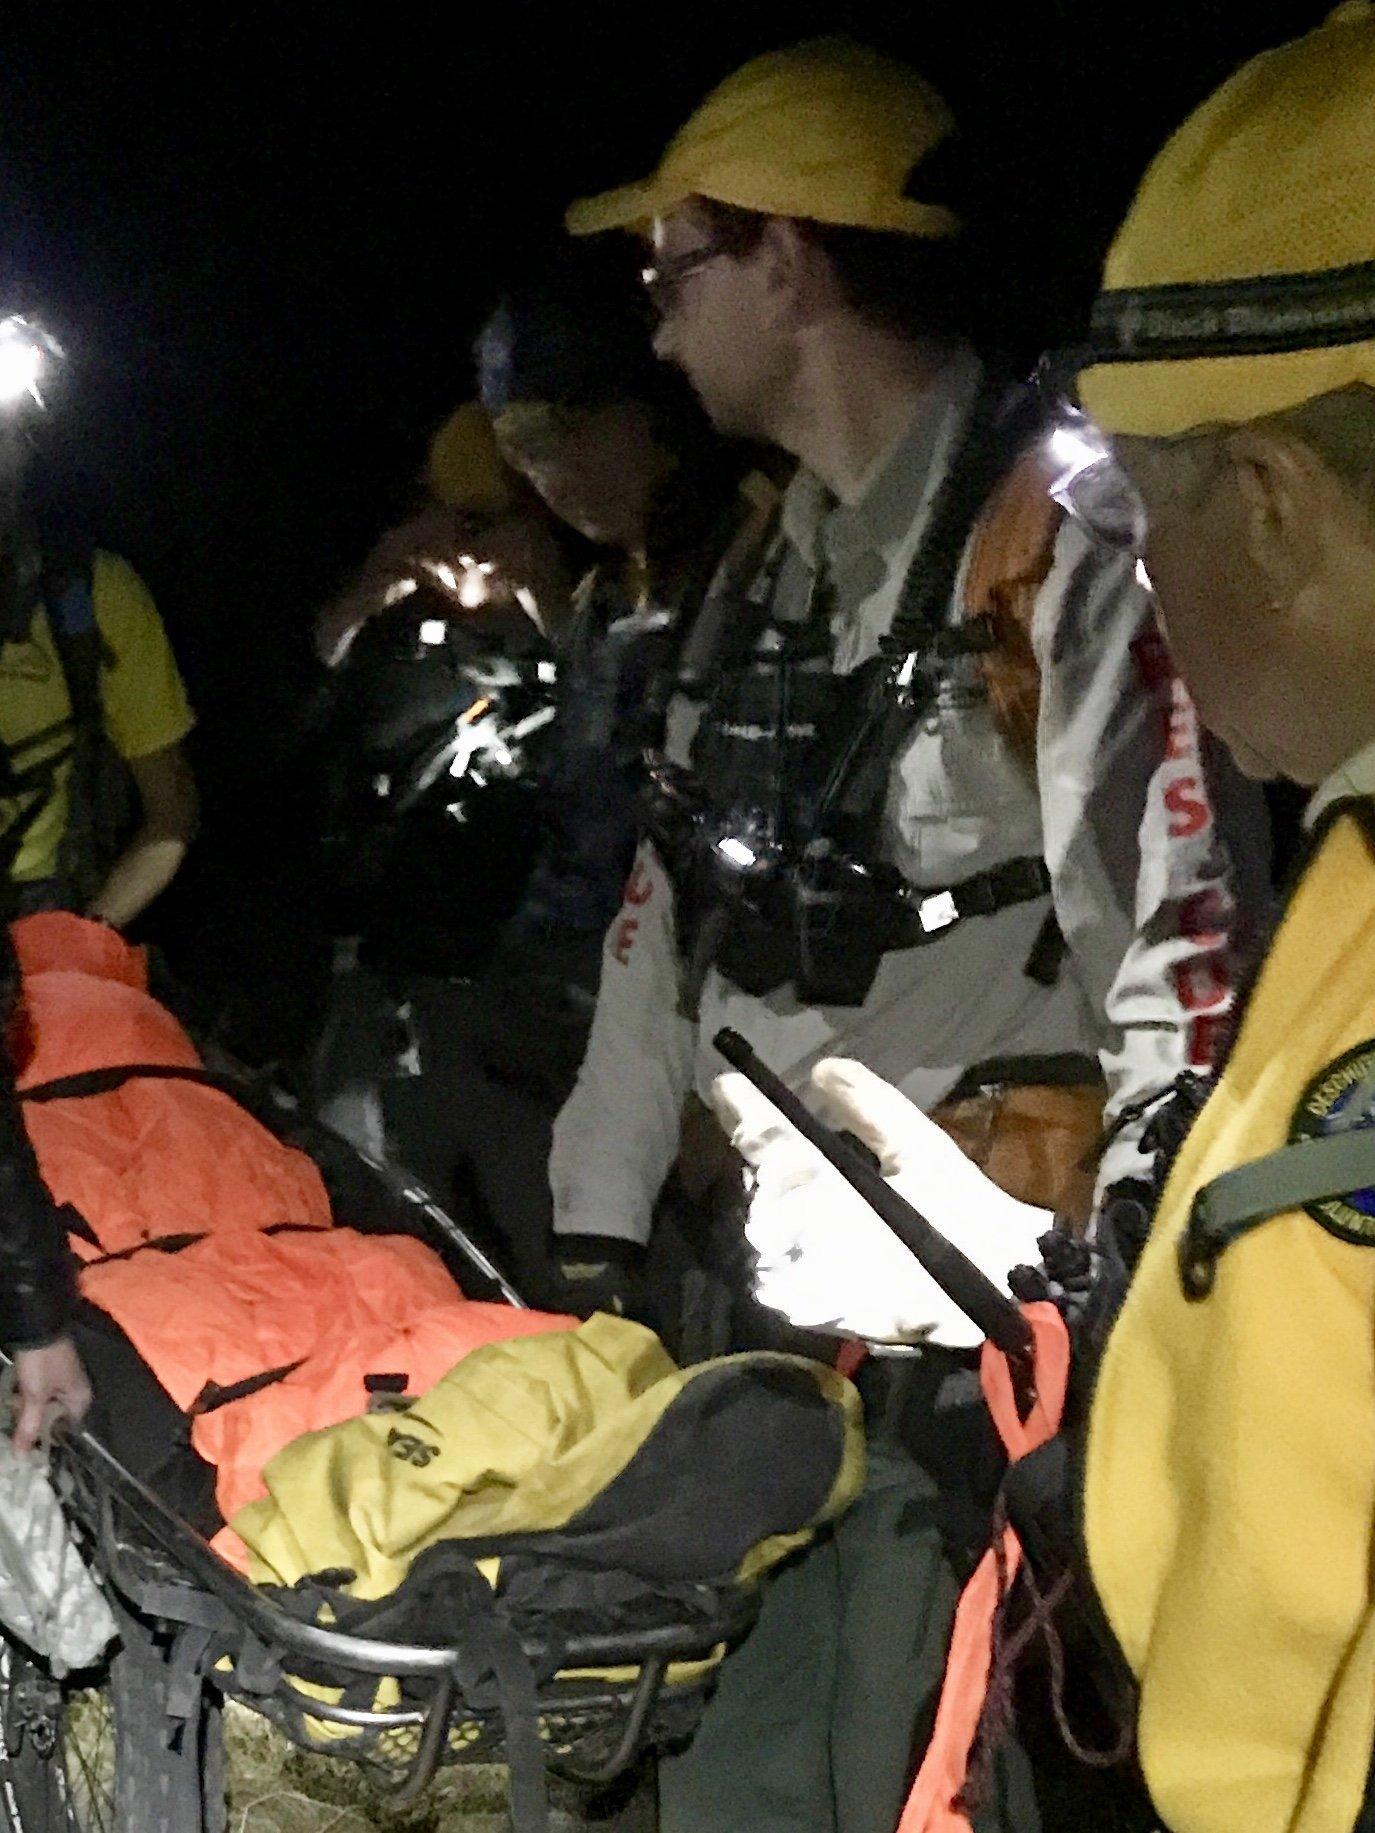 INJURED MOUNTAIN BIKER RESCUED NEAR SWAMPY LAKES SNOW PARK